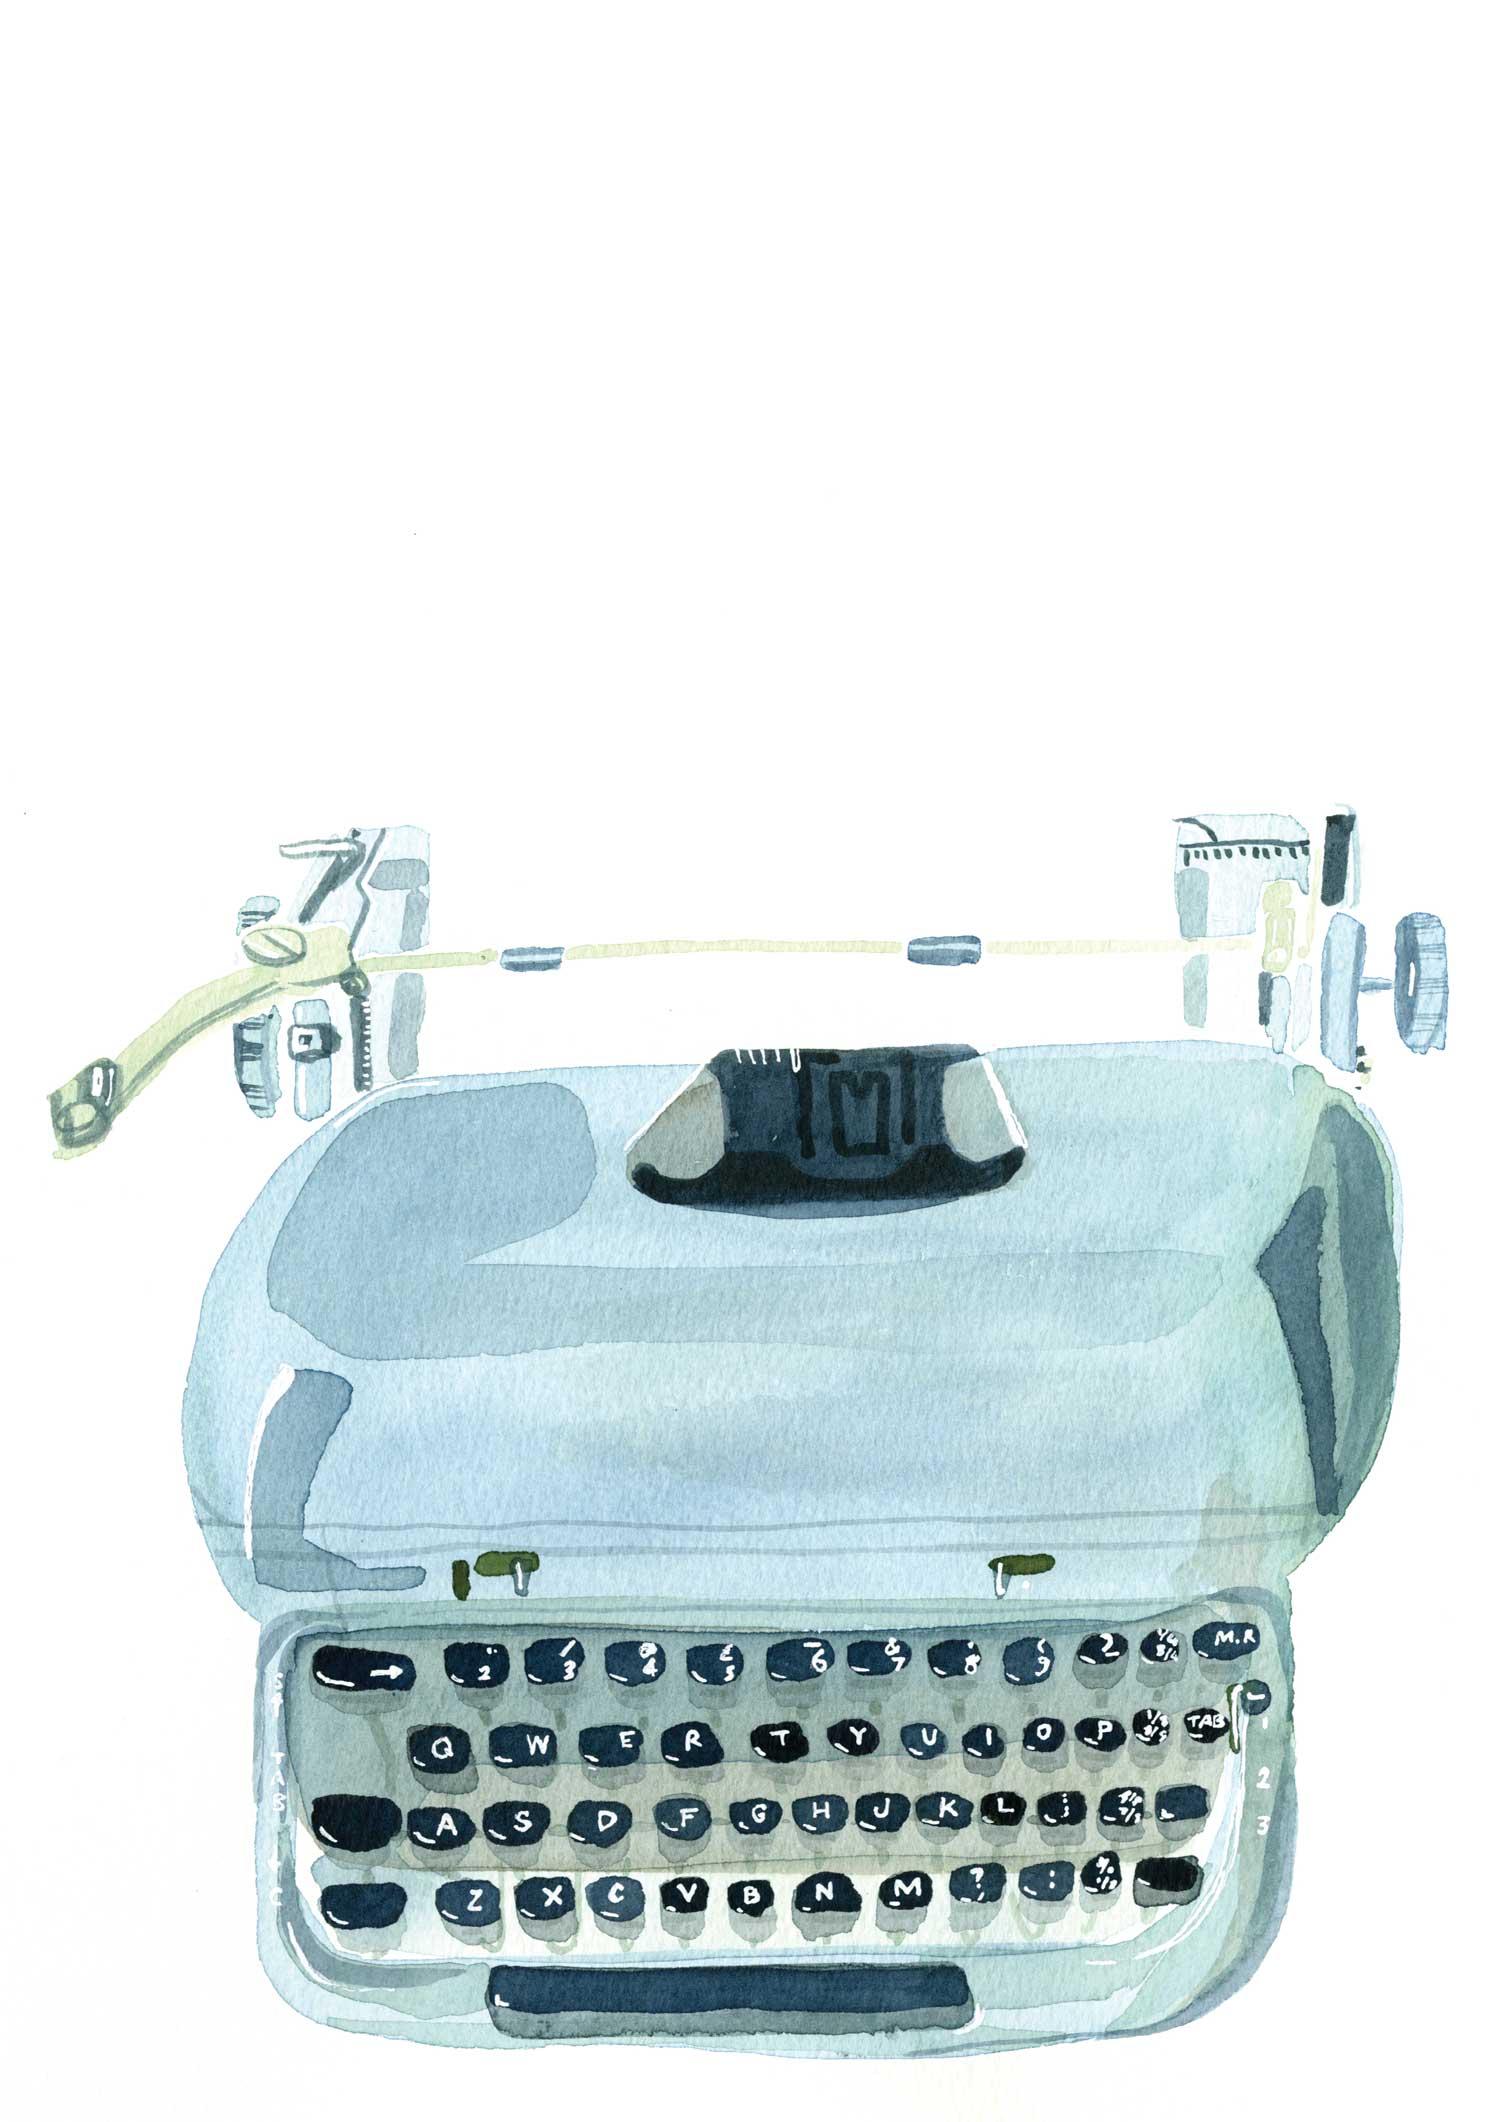 typewriter-watercolour-katie-chappell.jpg